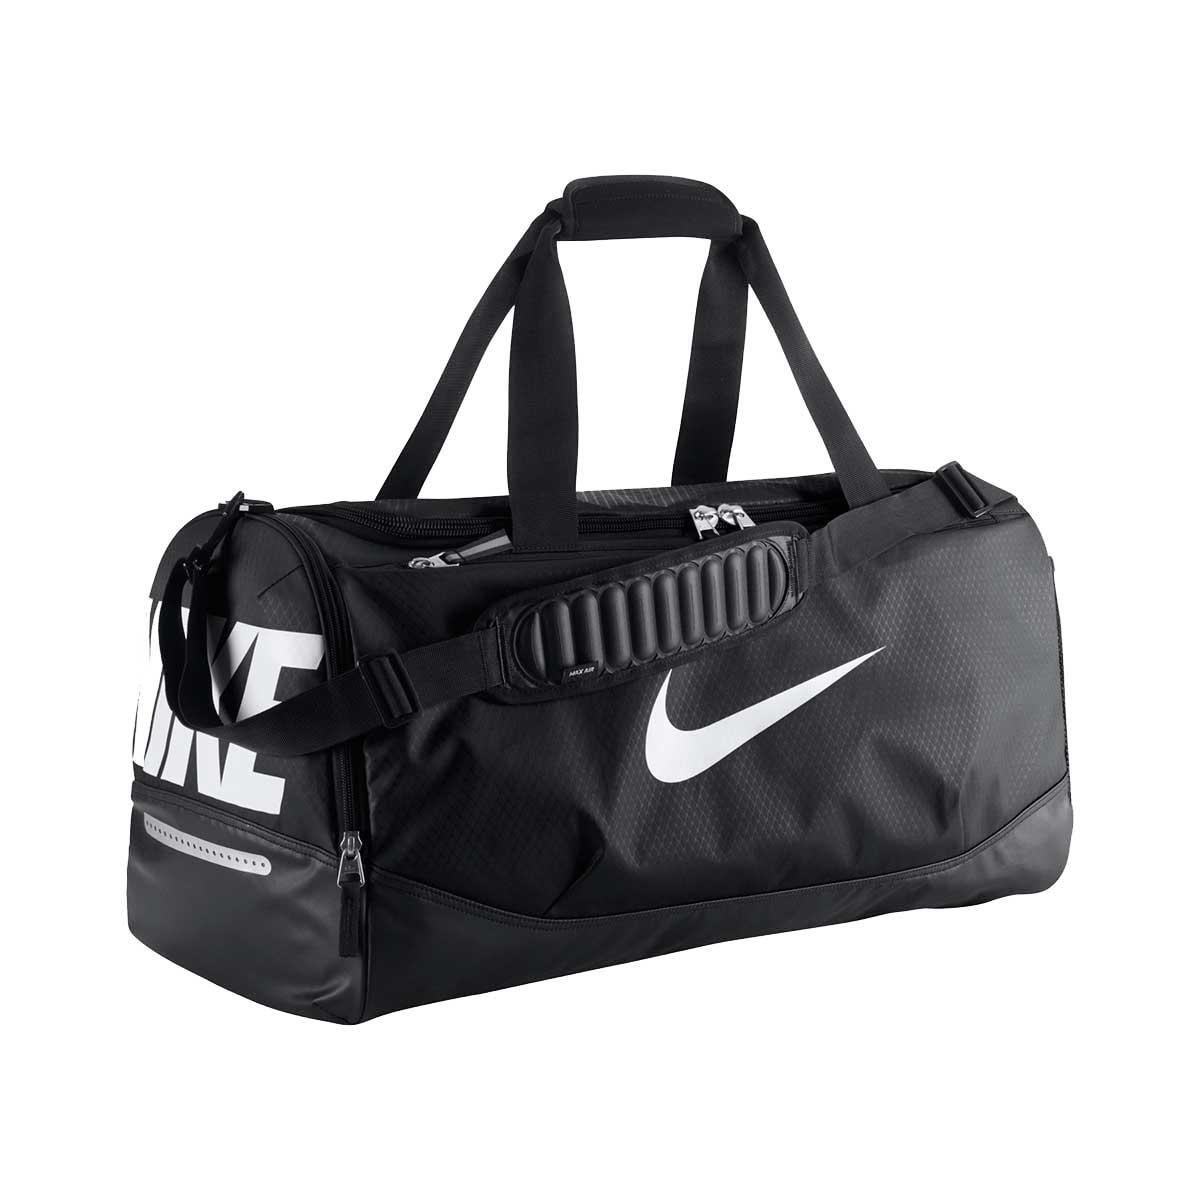 huge selection of ab73c 144d0 Buy Nike Team Training Max Air Medium Bag Online India